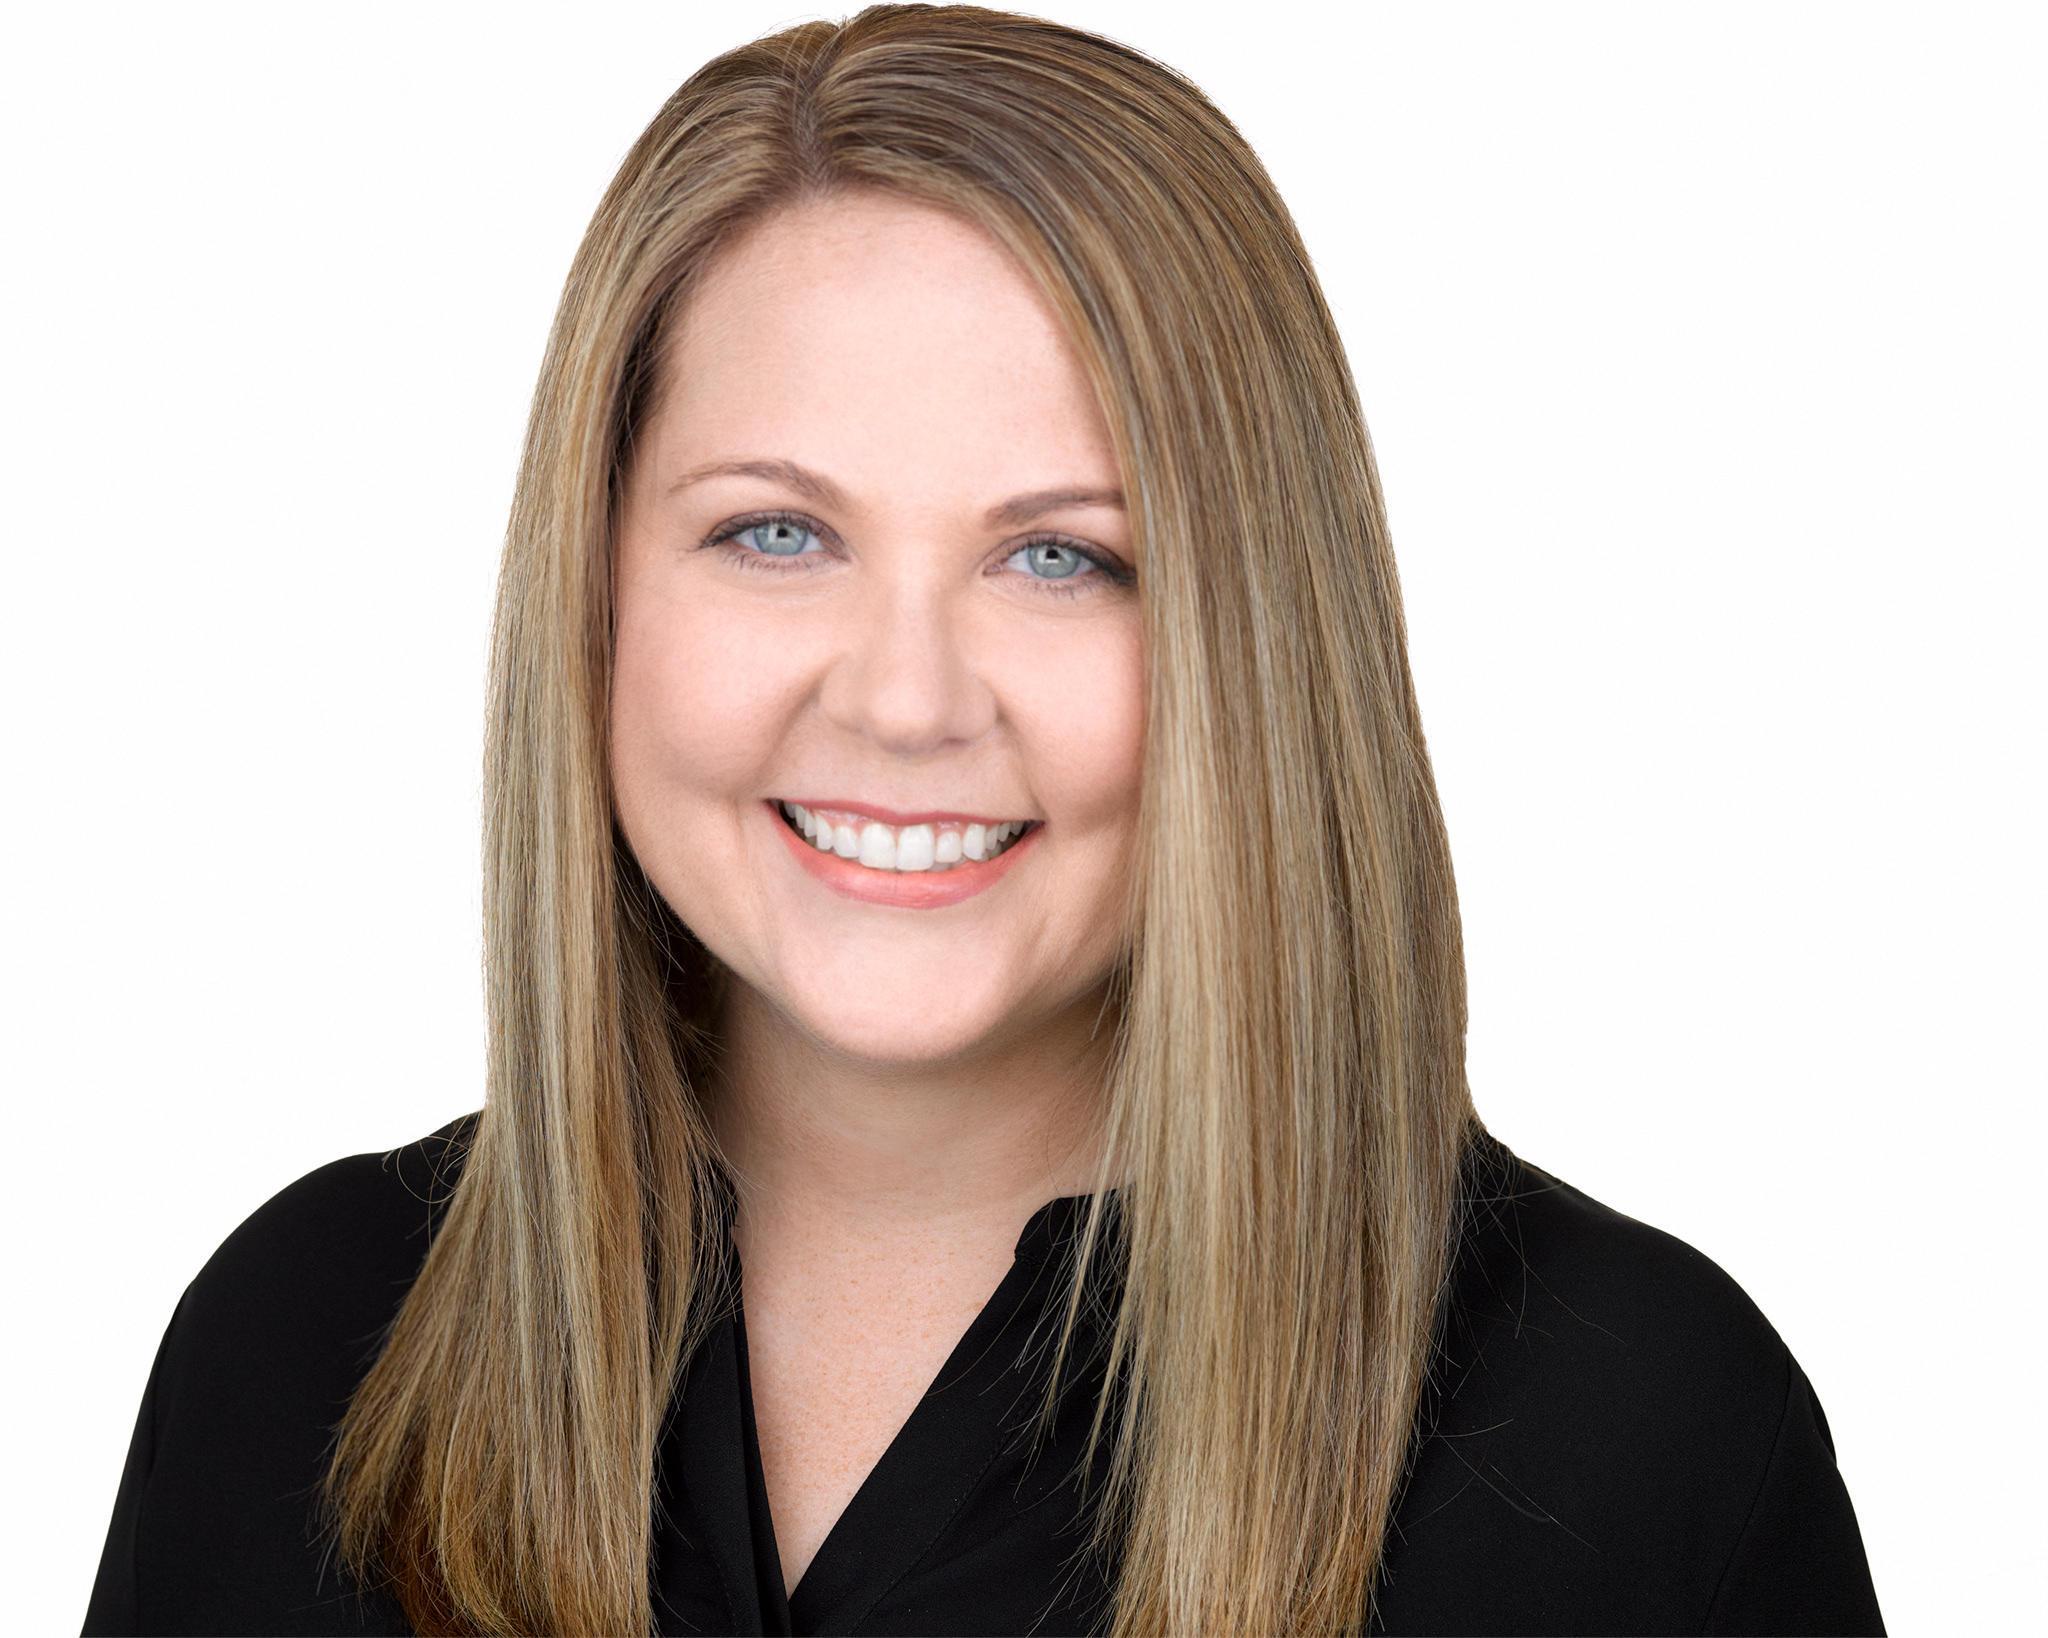 Attorney Christina Hollwarth